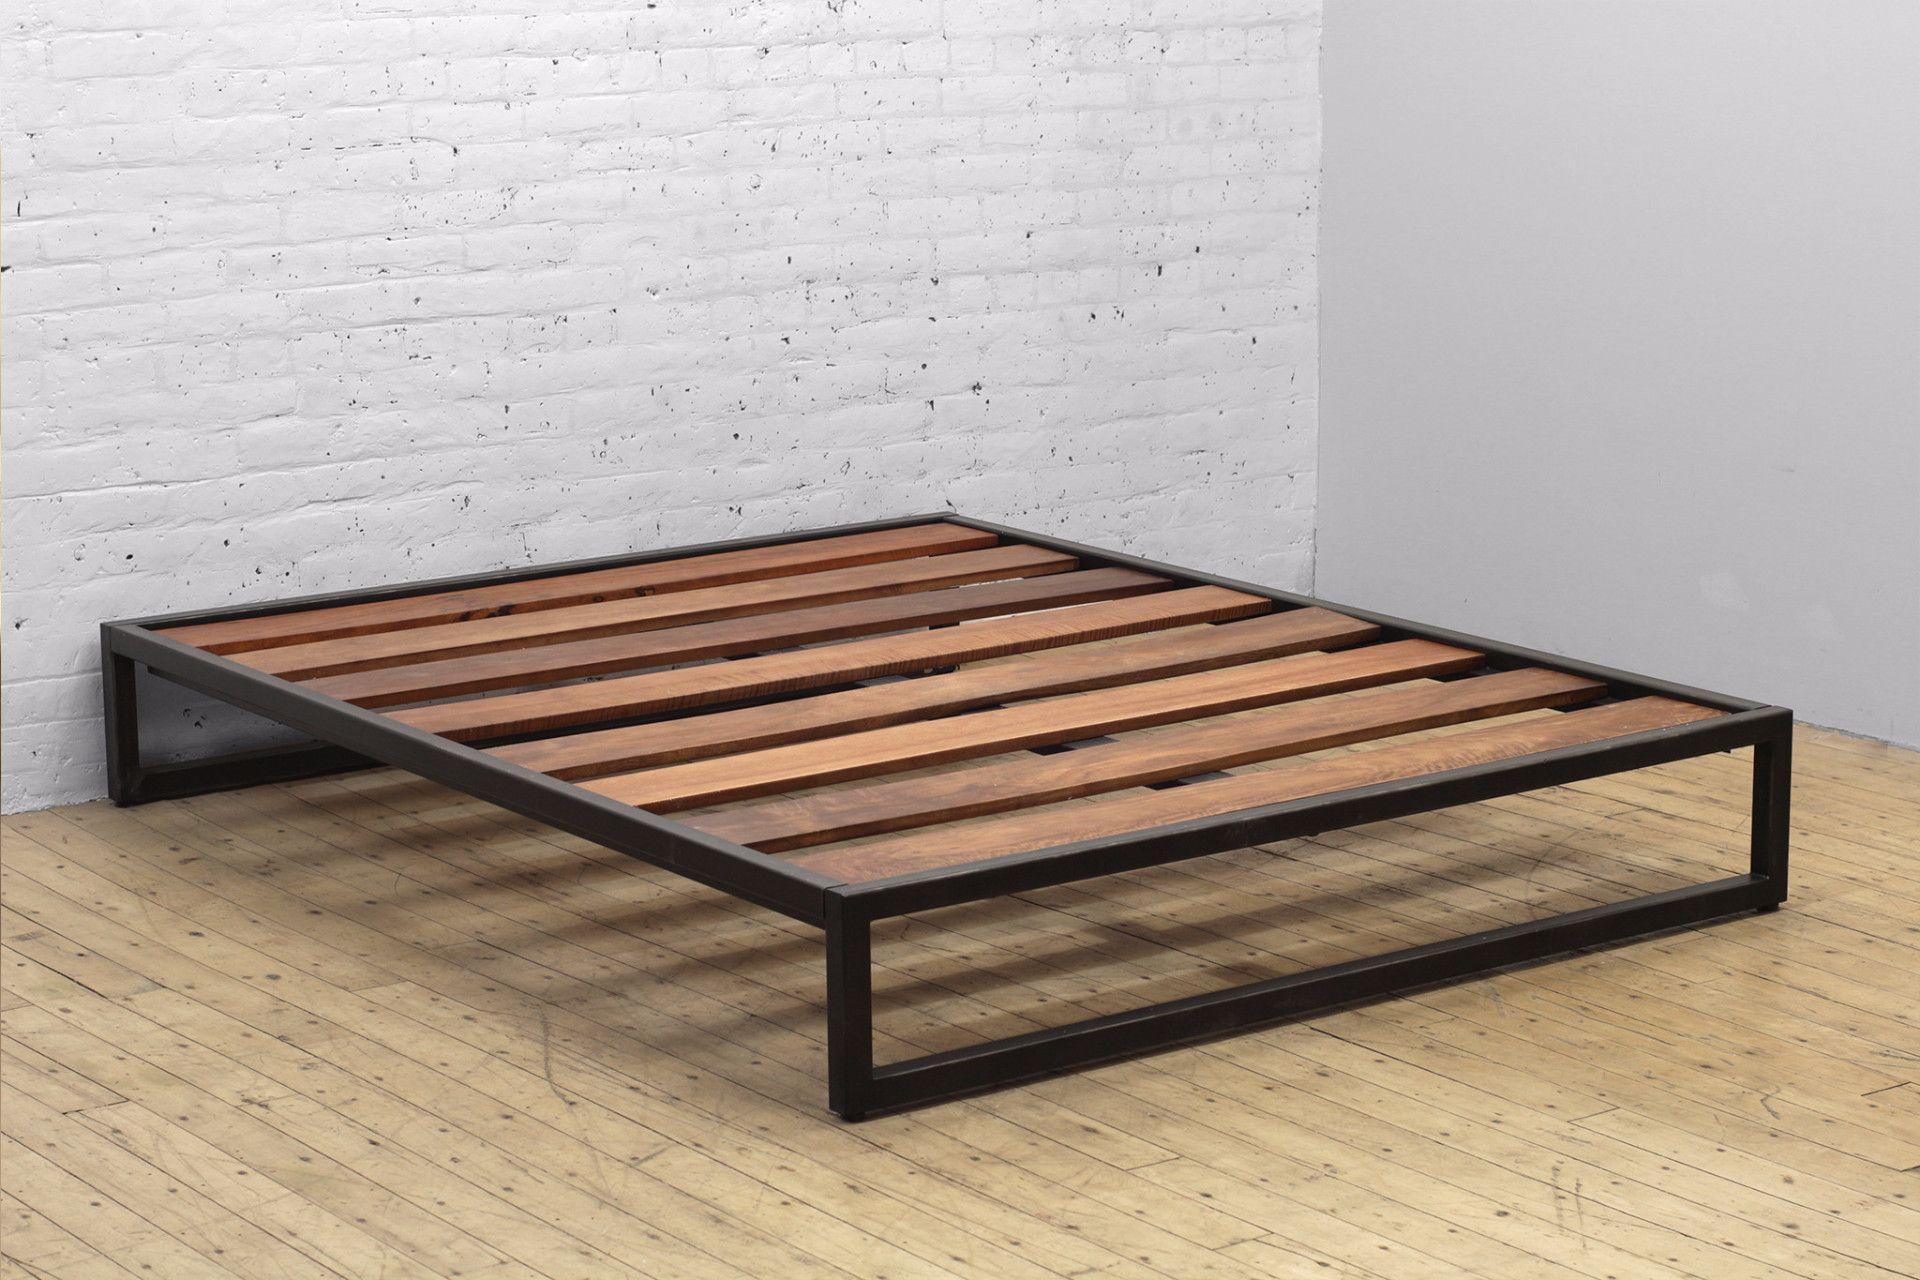 Ikan Bed Steel Bed Design Rustic Furniture Steel Bed Frame